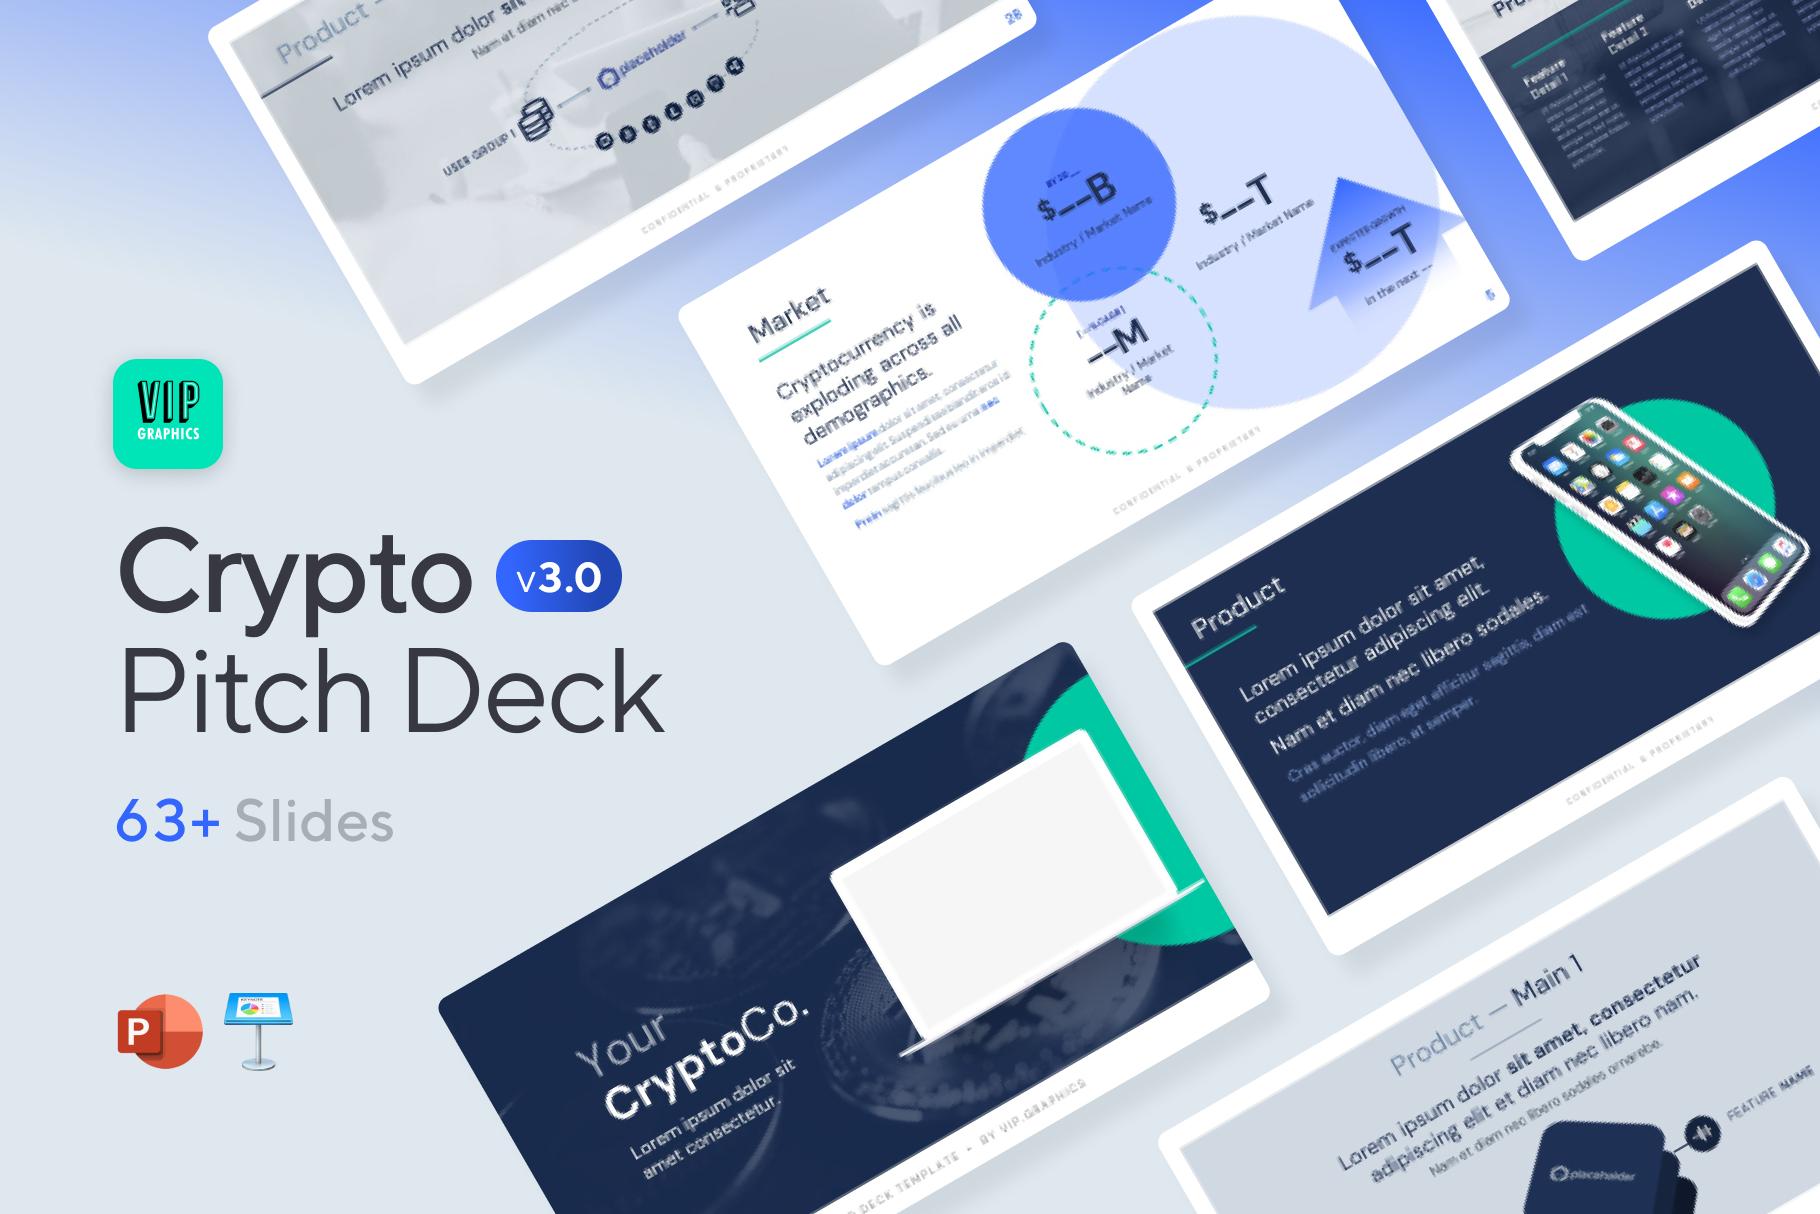 Crypto Pitch Presentation Template Slide Deck | VIP.graphics